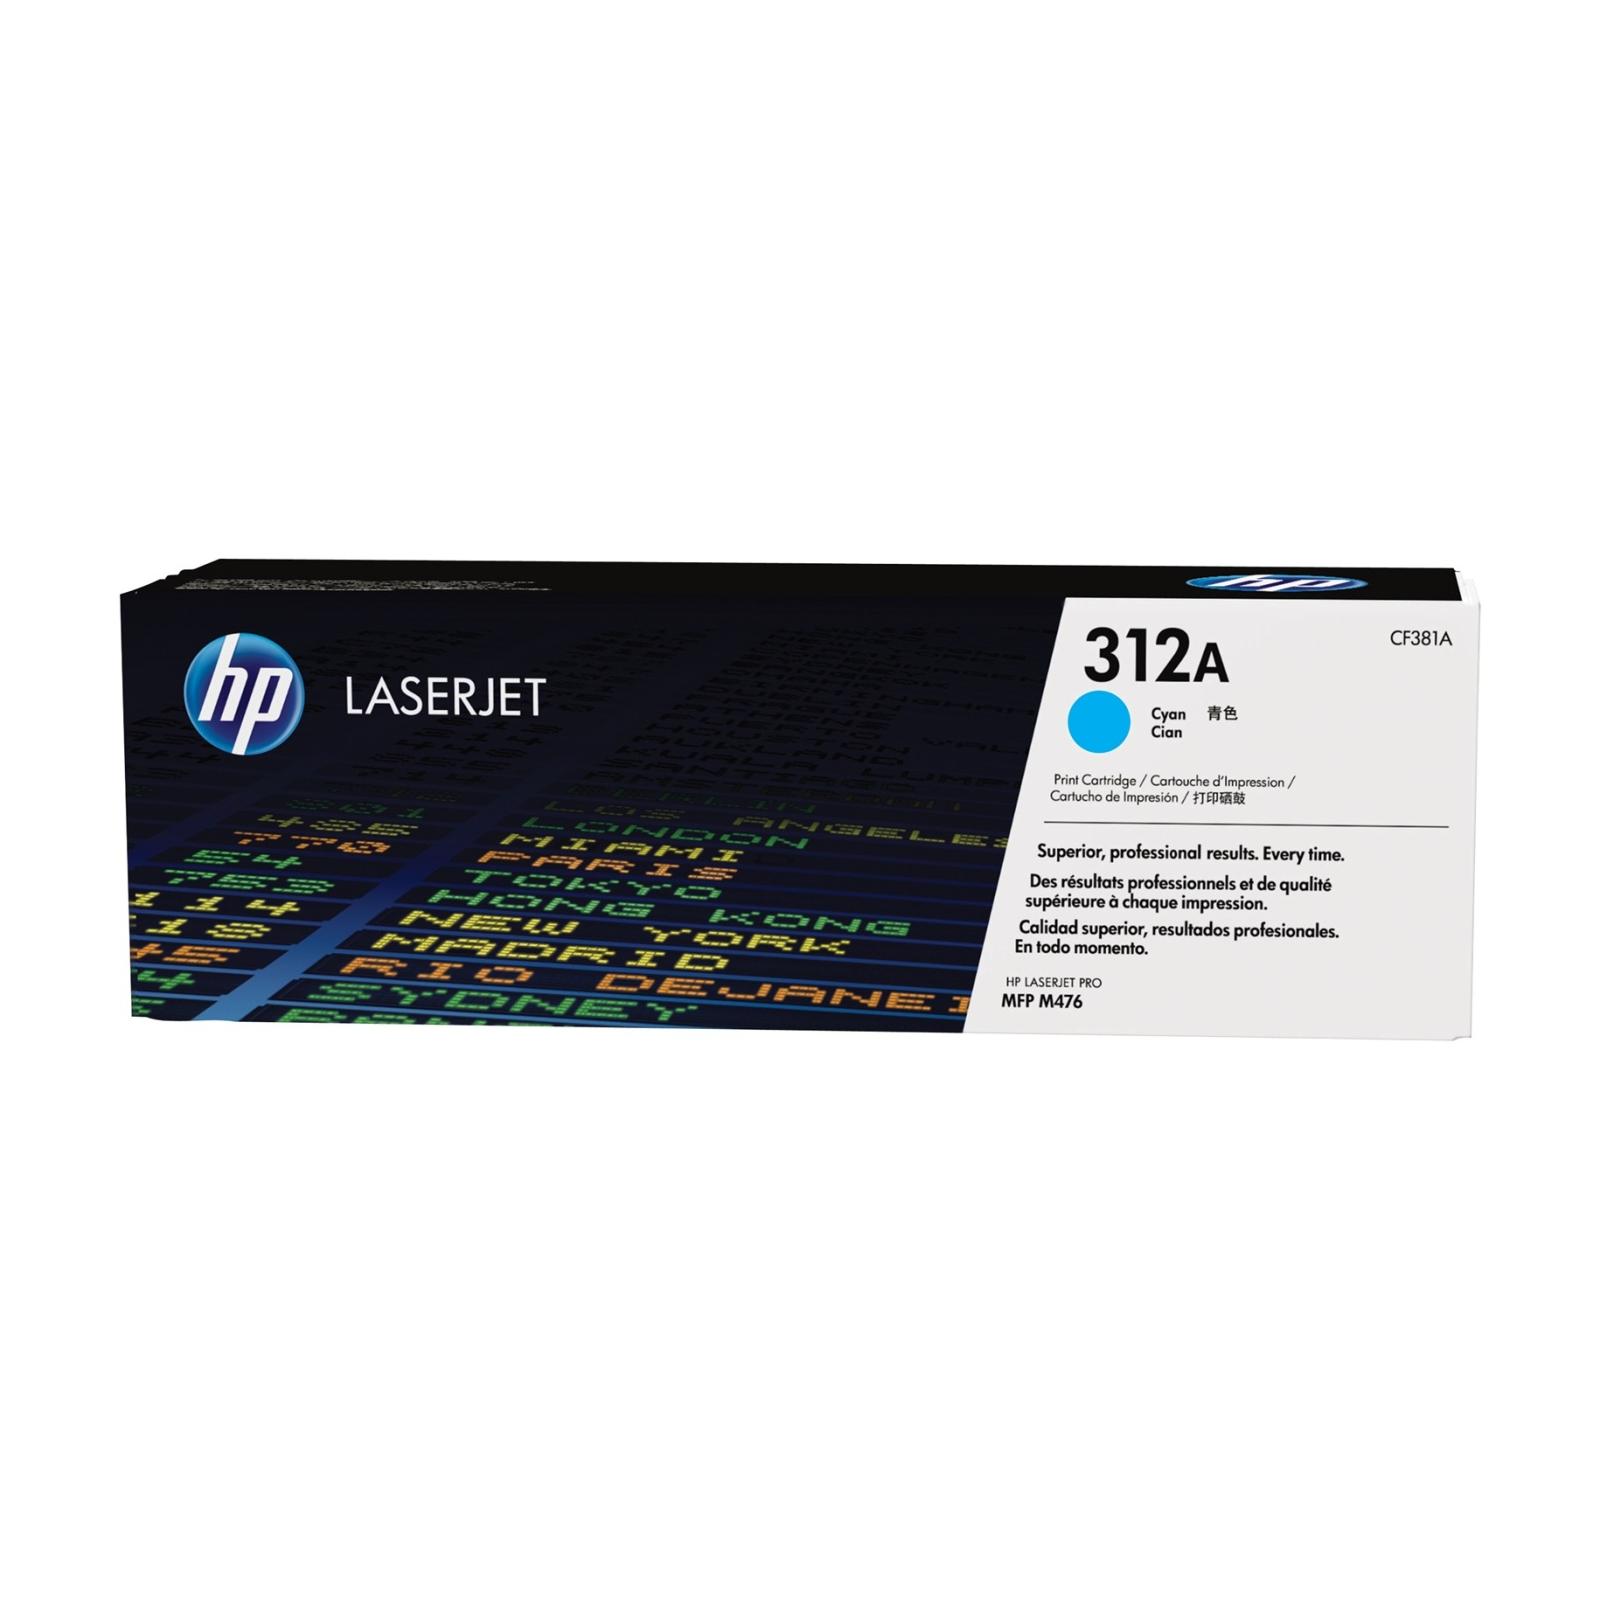 Картридж HP CLJ  312A Cyan LJ Pro M476dn/M476dw/M476nw (CF381A)